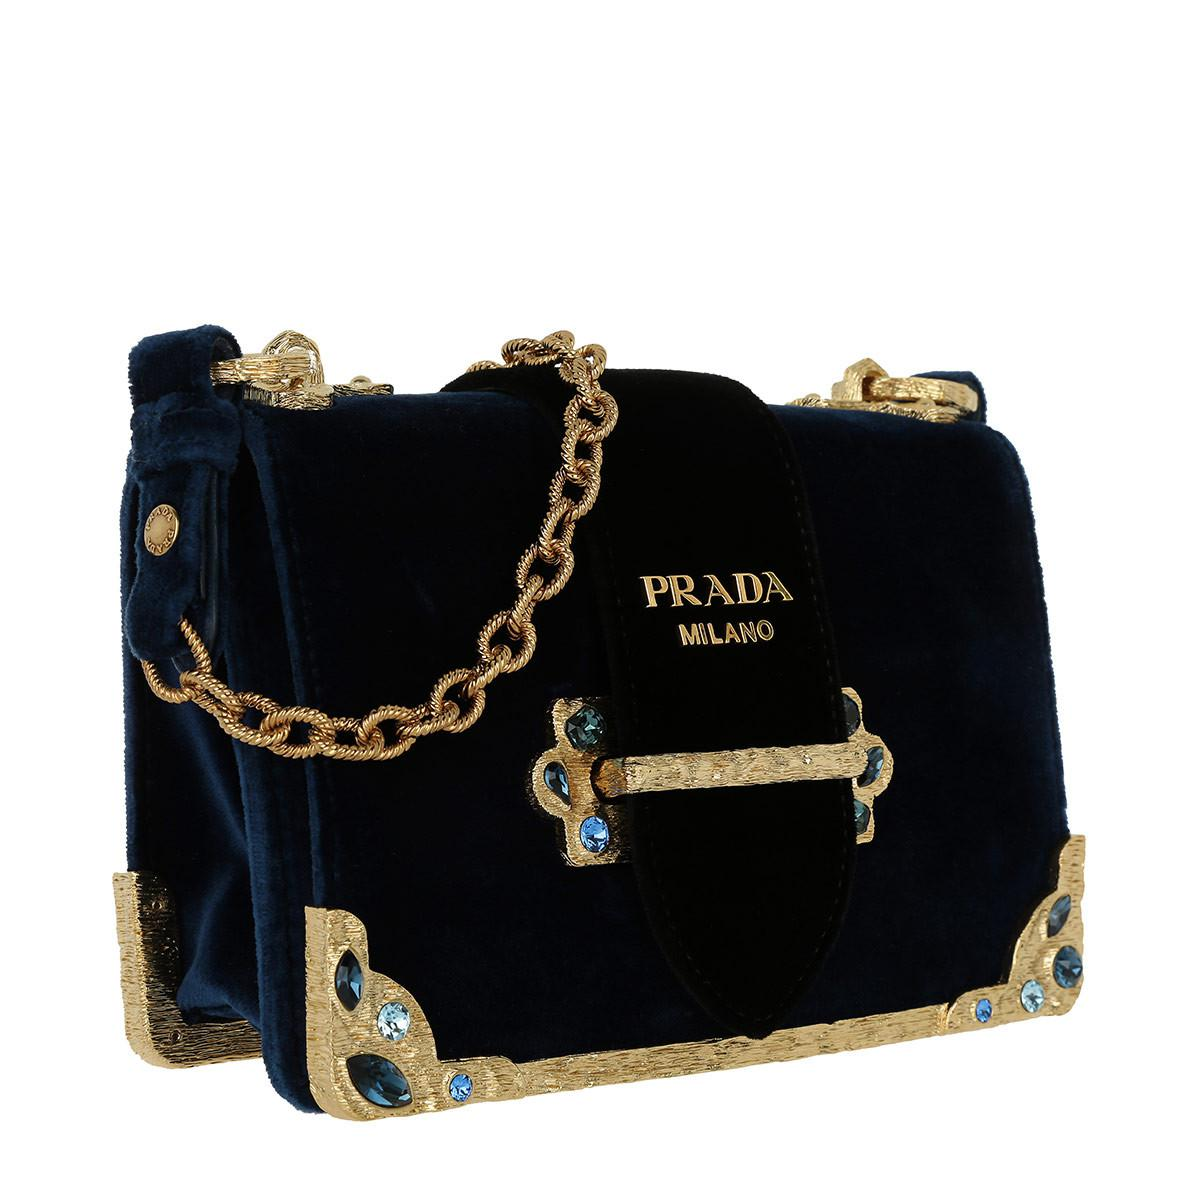 88ea90418ae4 ... top quality prada cahier velvet bag zaffiro nero in black lyst 6924c  c8892